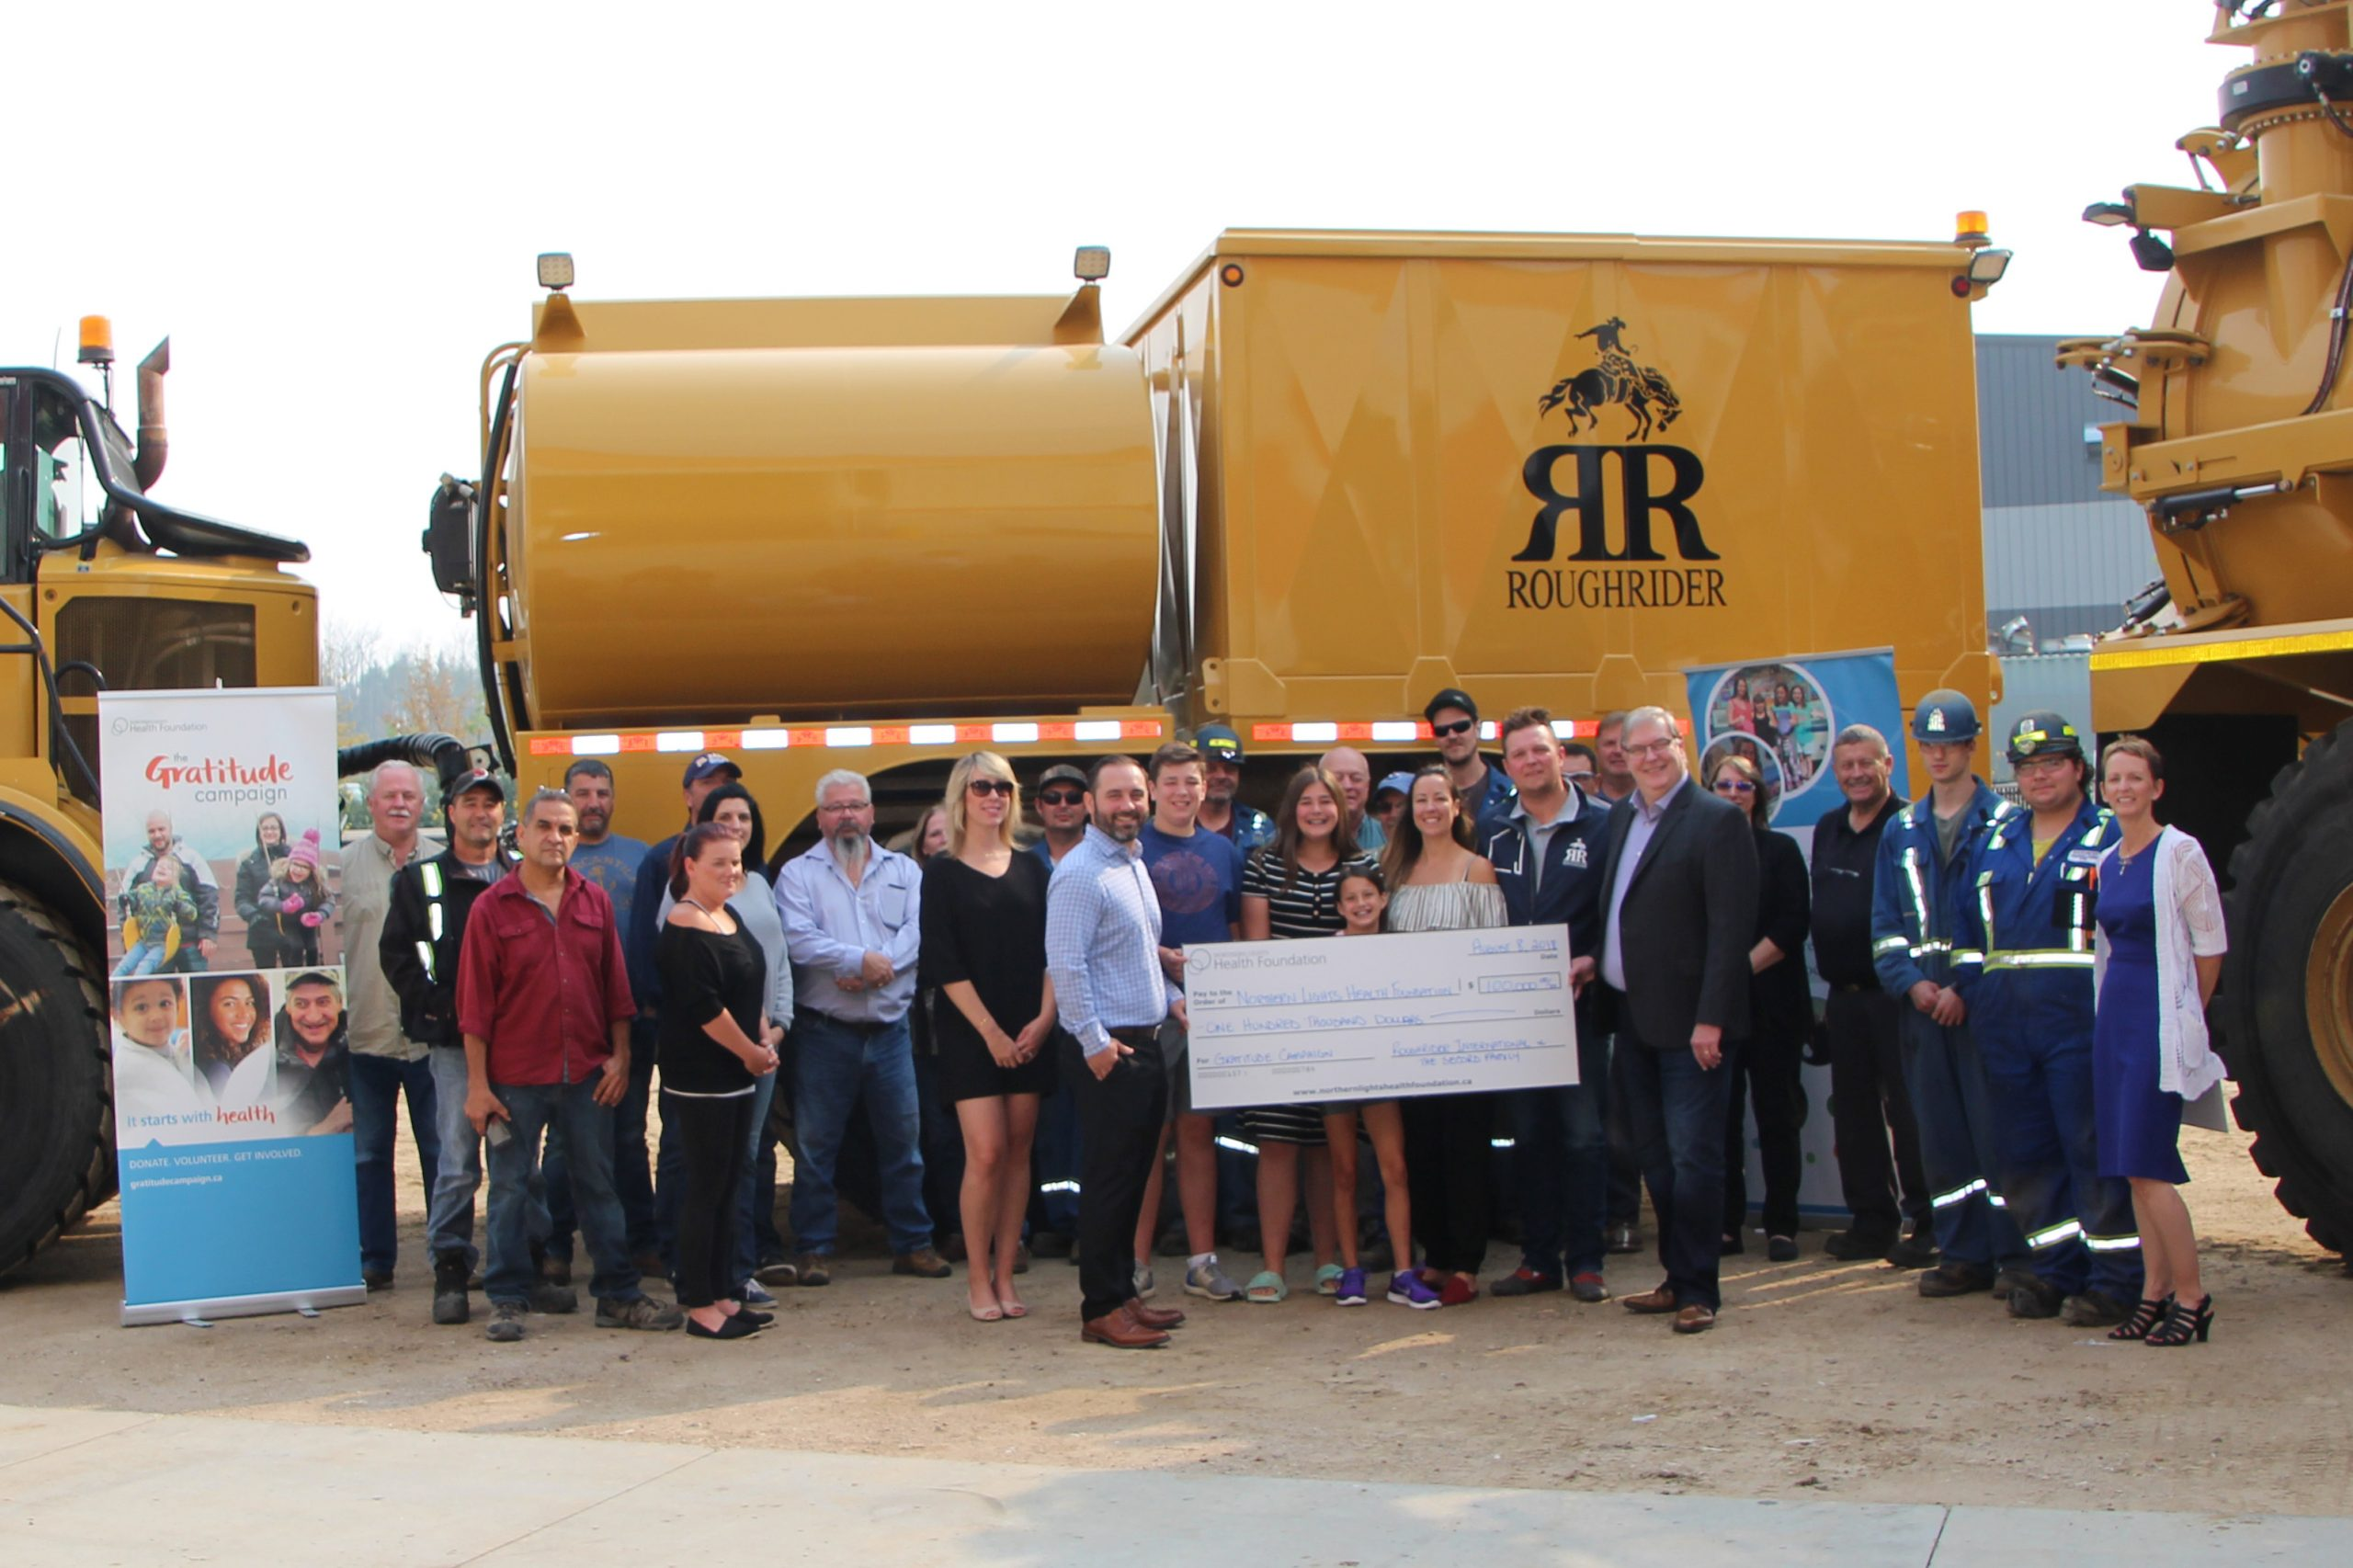 Gratitude Campaign Receives $100,000 Donation Toward MIS Project